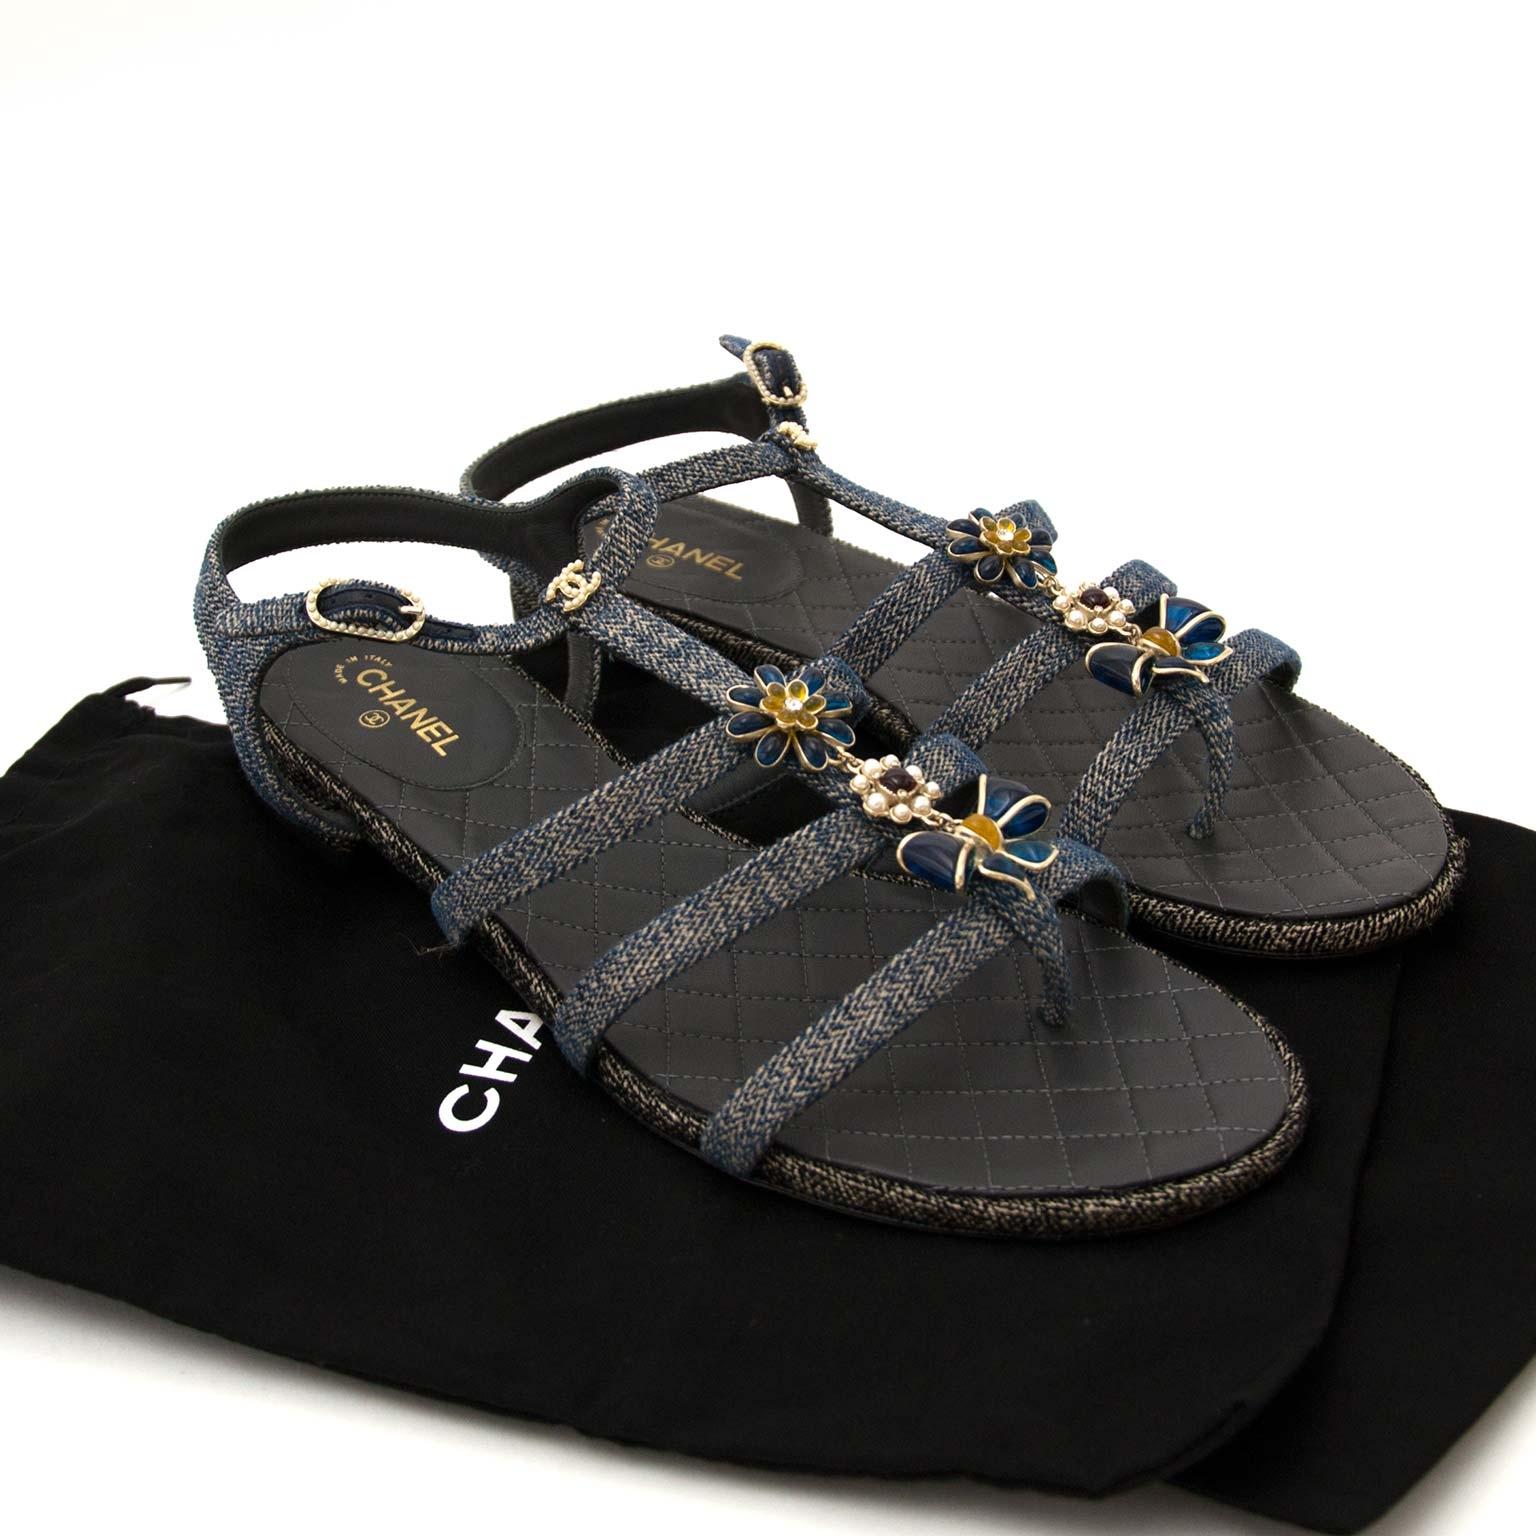 Chanel Denim Embellished Sandals - Size 41 online tegen de beste prijs